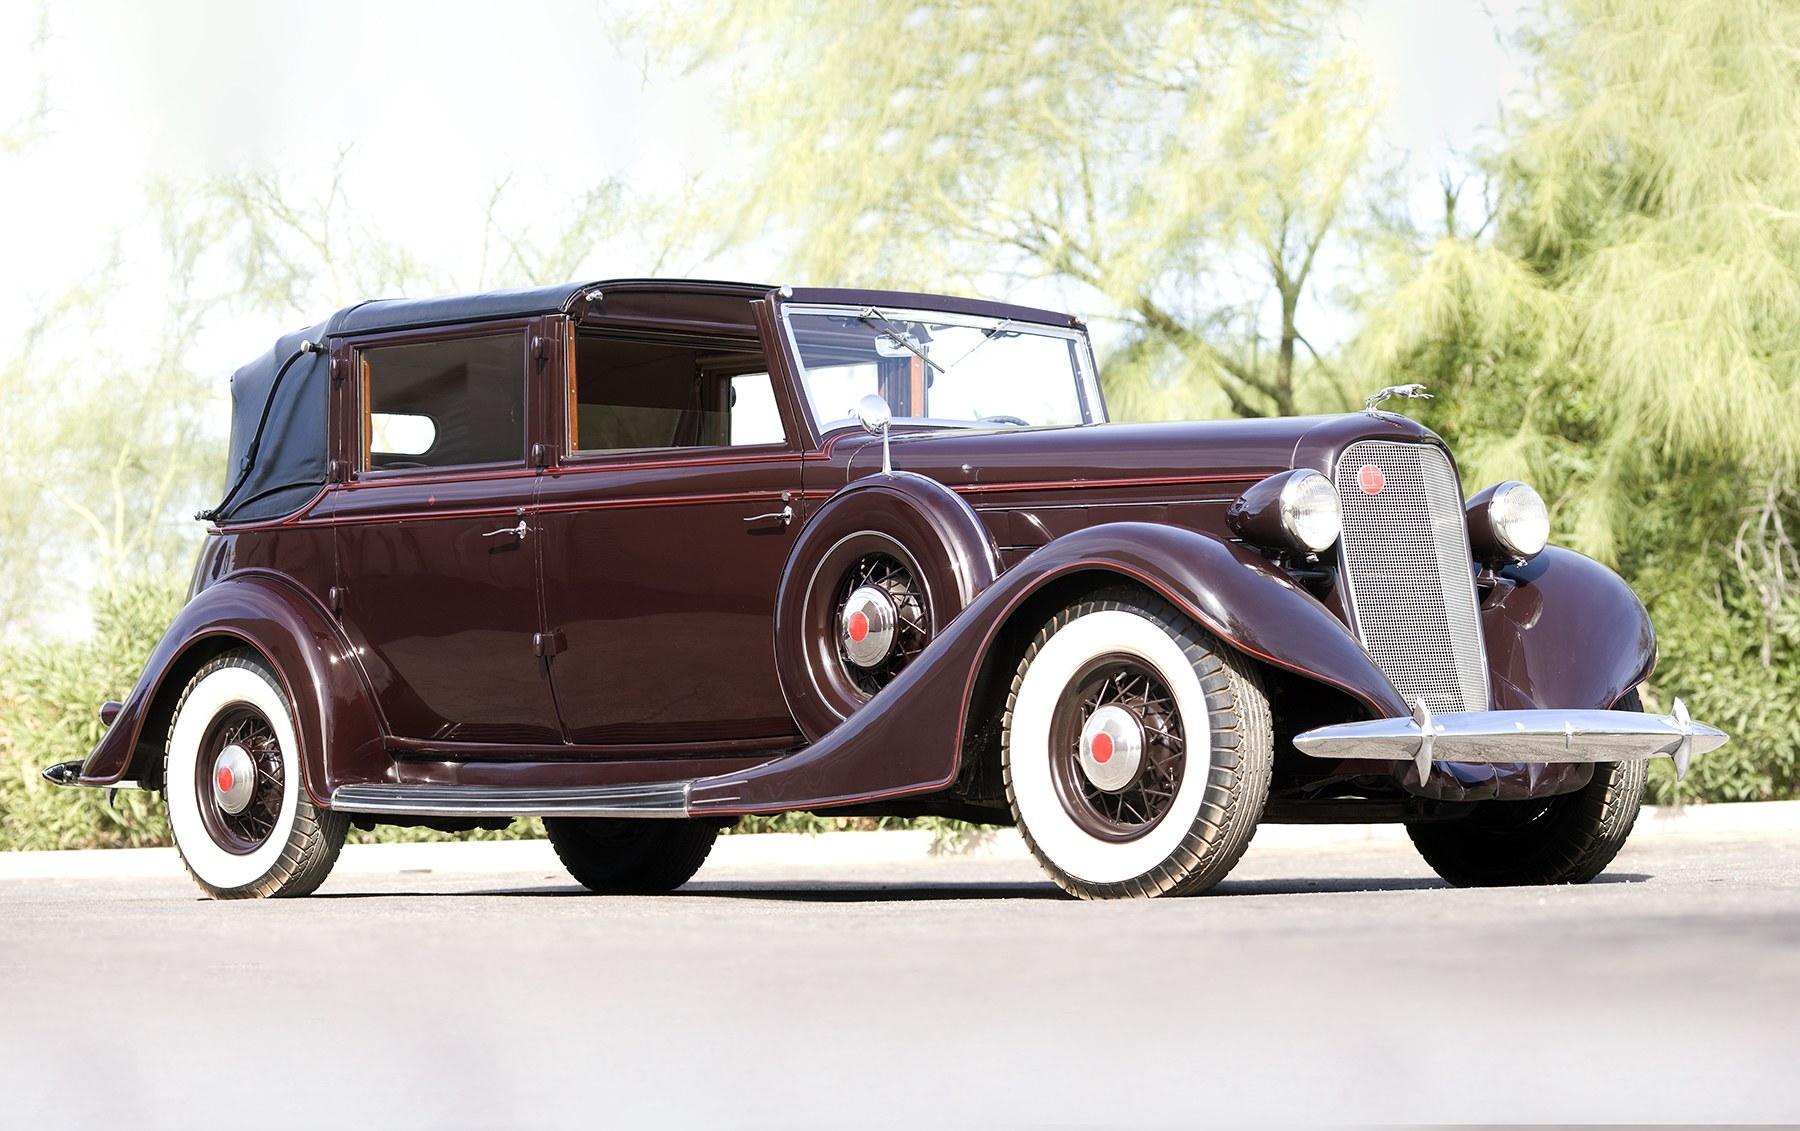 1935 Lincoln Model K Semi-Collapsable Cabriolet